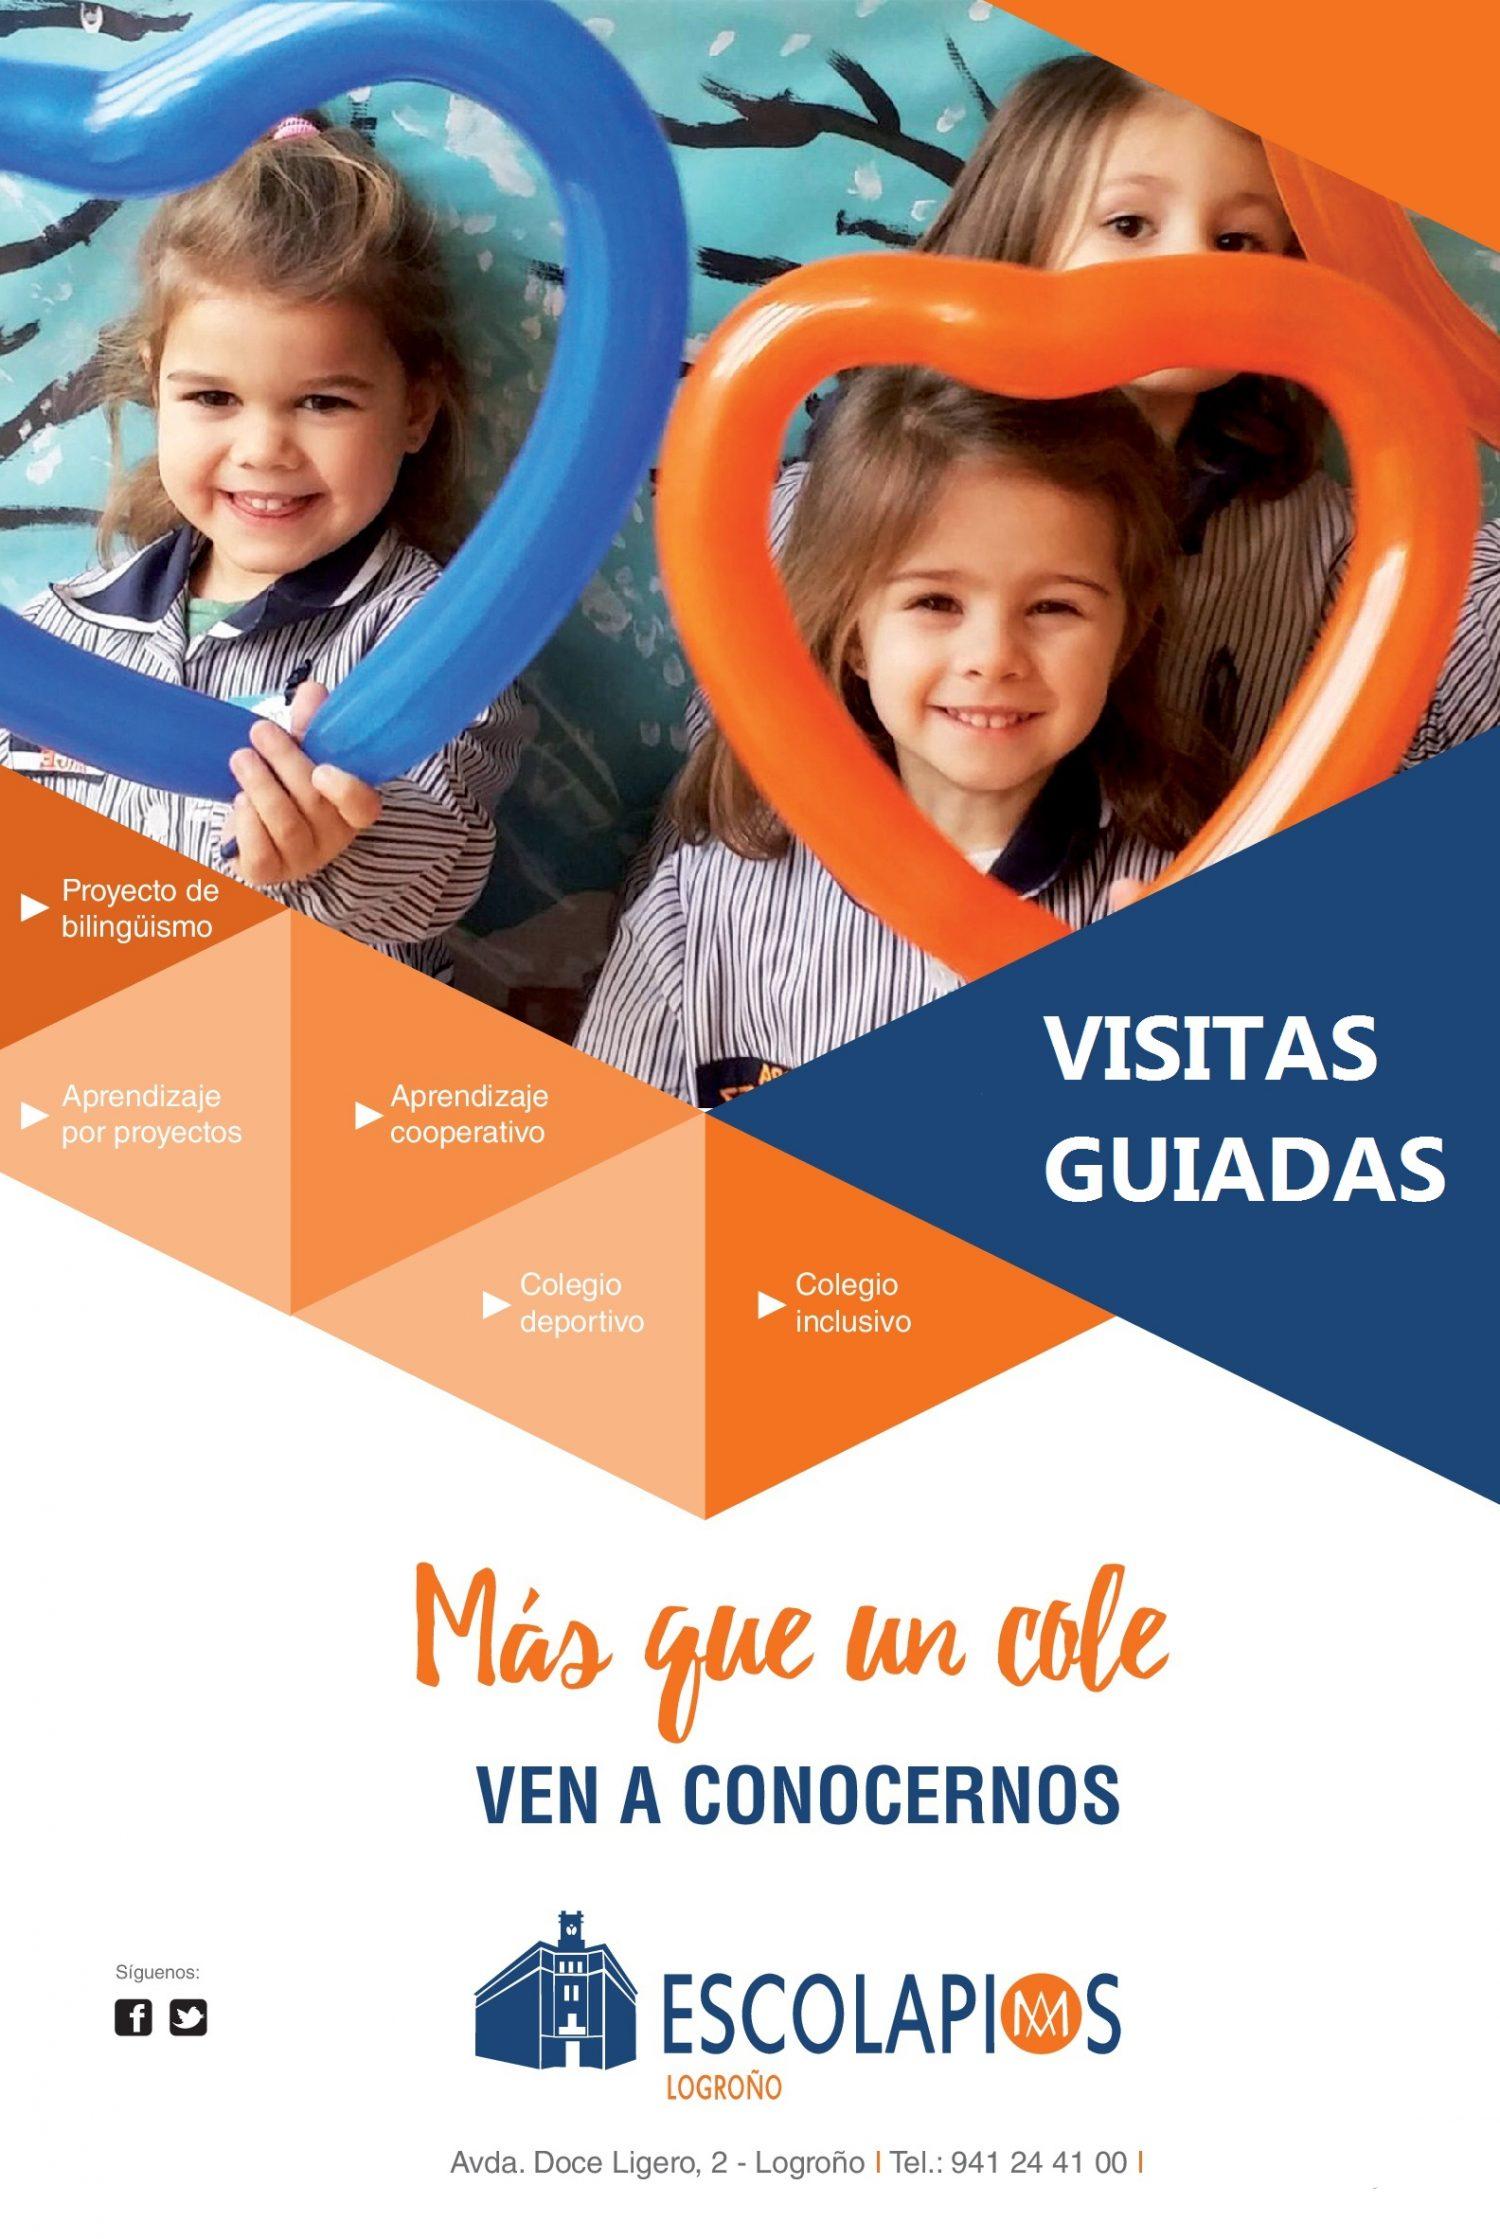 Visitas Guiadas Escolapios Logroño Guiadas Logroño Visitas Escolapios Colegio Colegio Guiadas Colegio Visitas rCBoexd